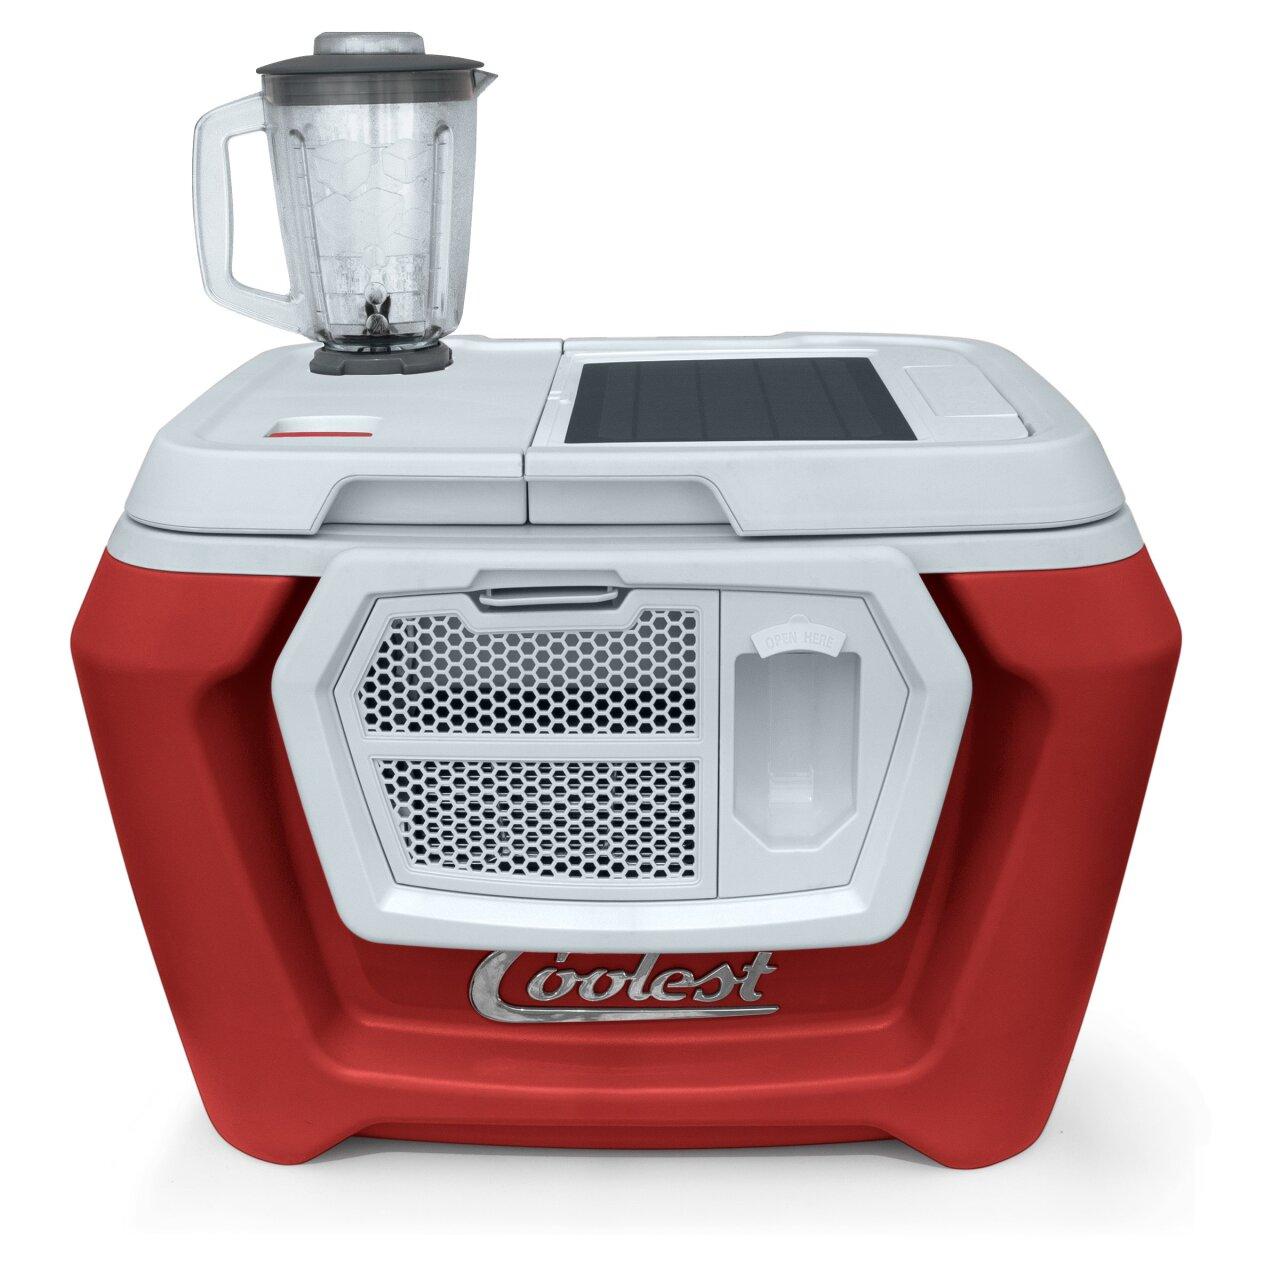 coolest cooler 2.jpg